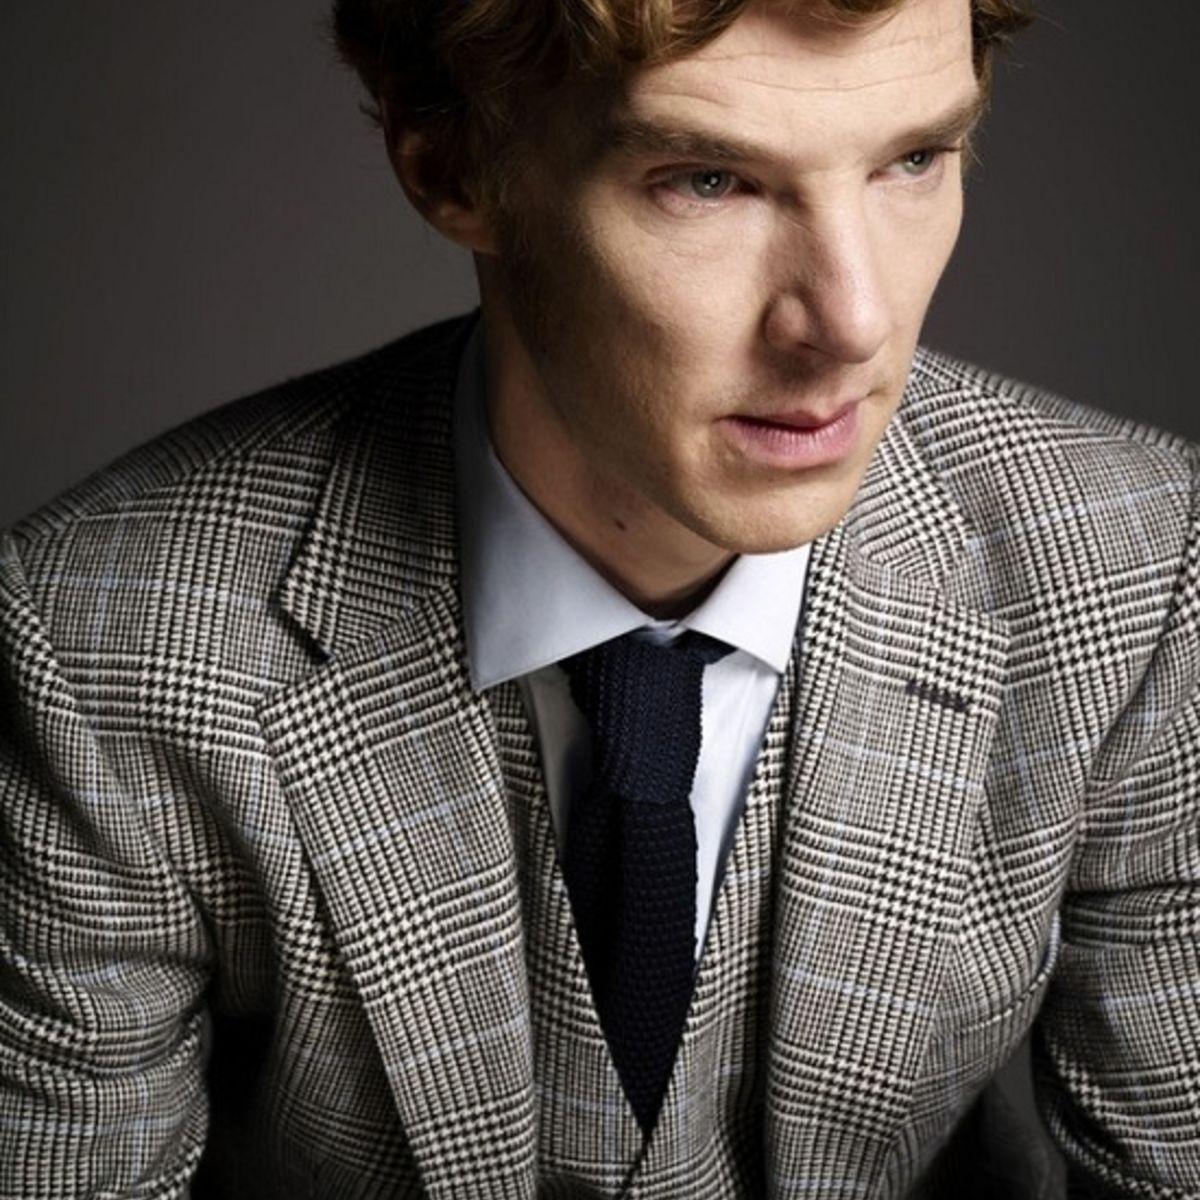 Benedict-Cumberbatch-sherlock-on-bbc-one-23311704-600-800.jpg